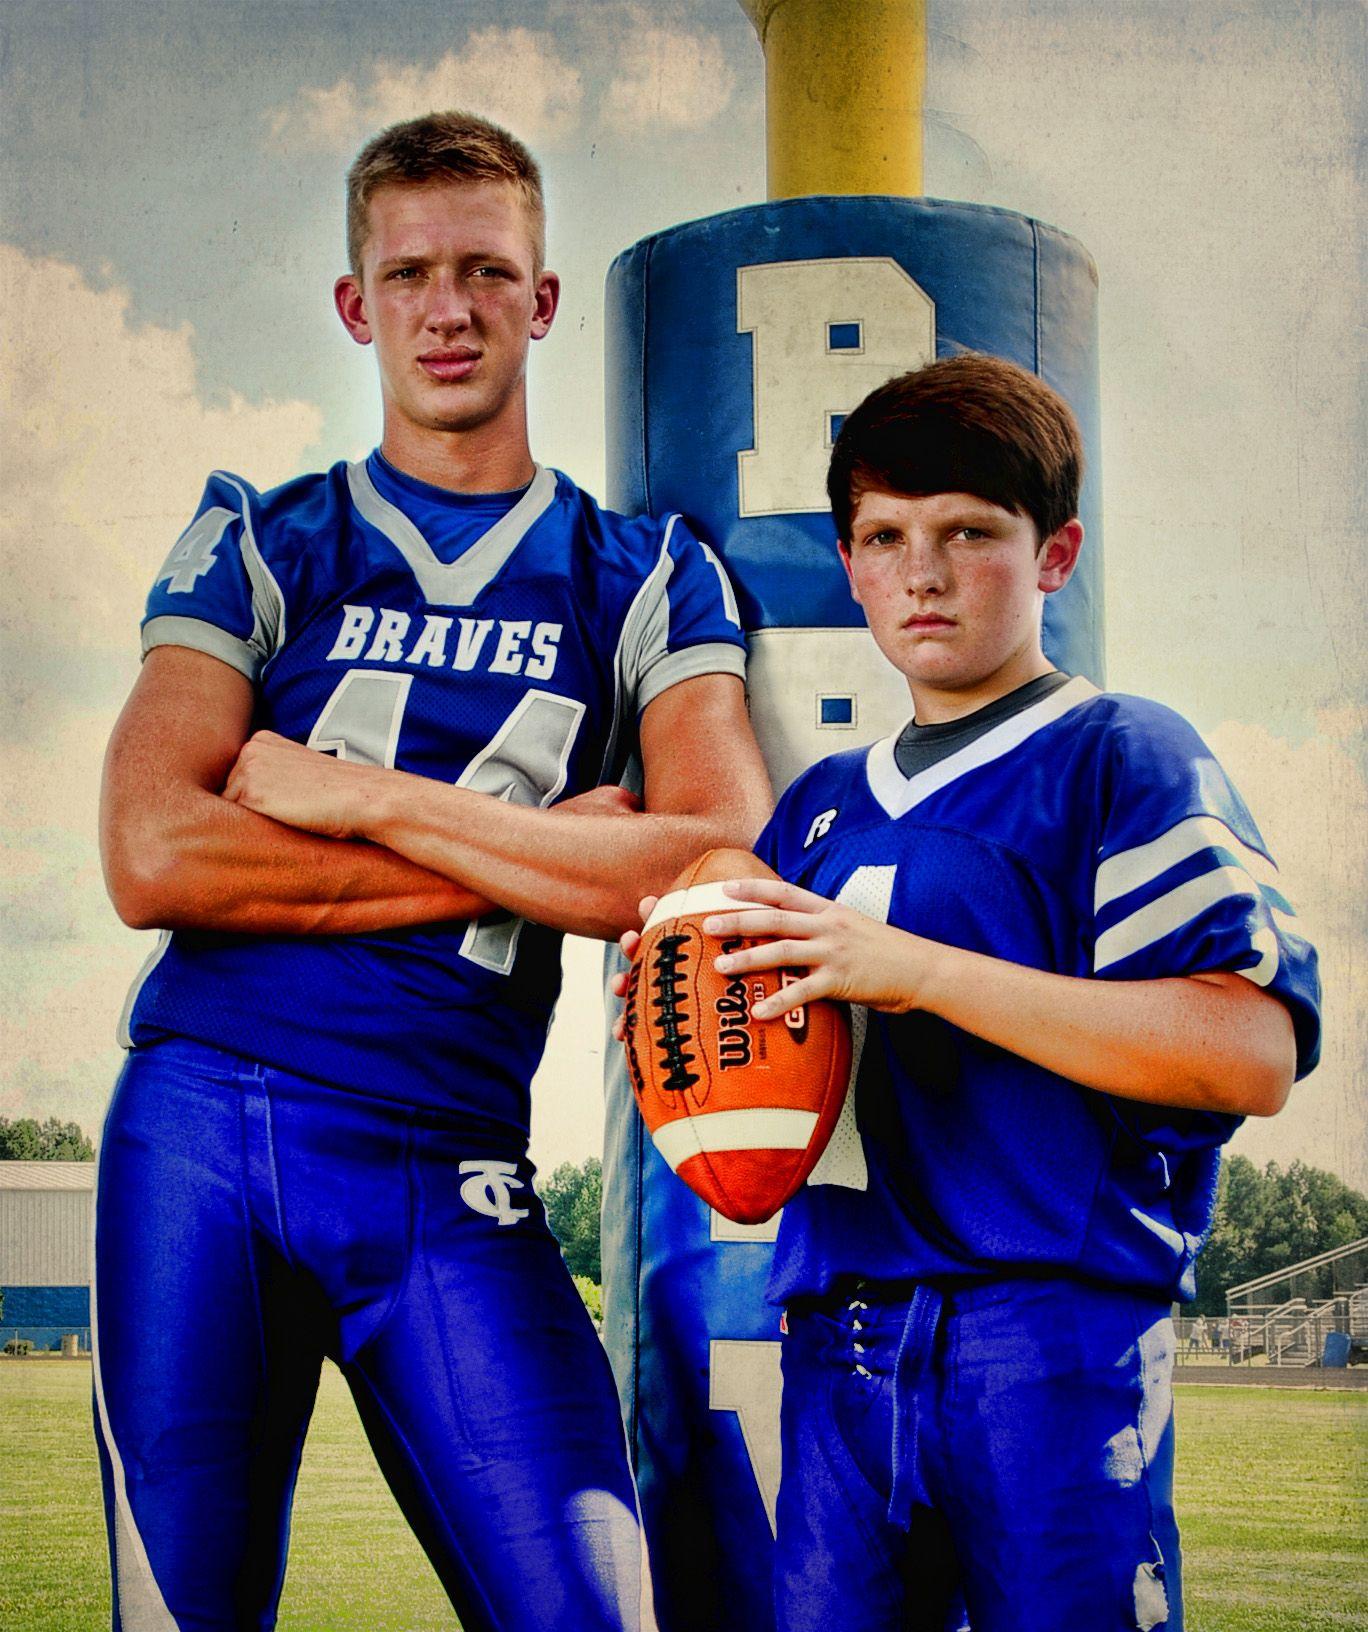 brothers sports football portrait high school | Sports ...